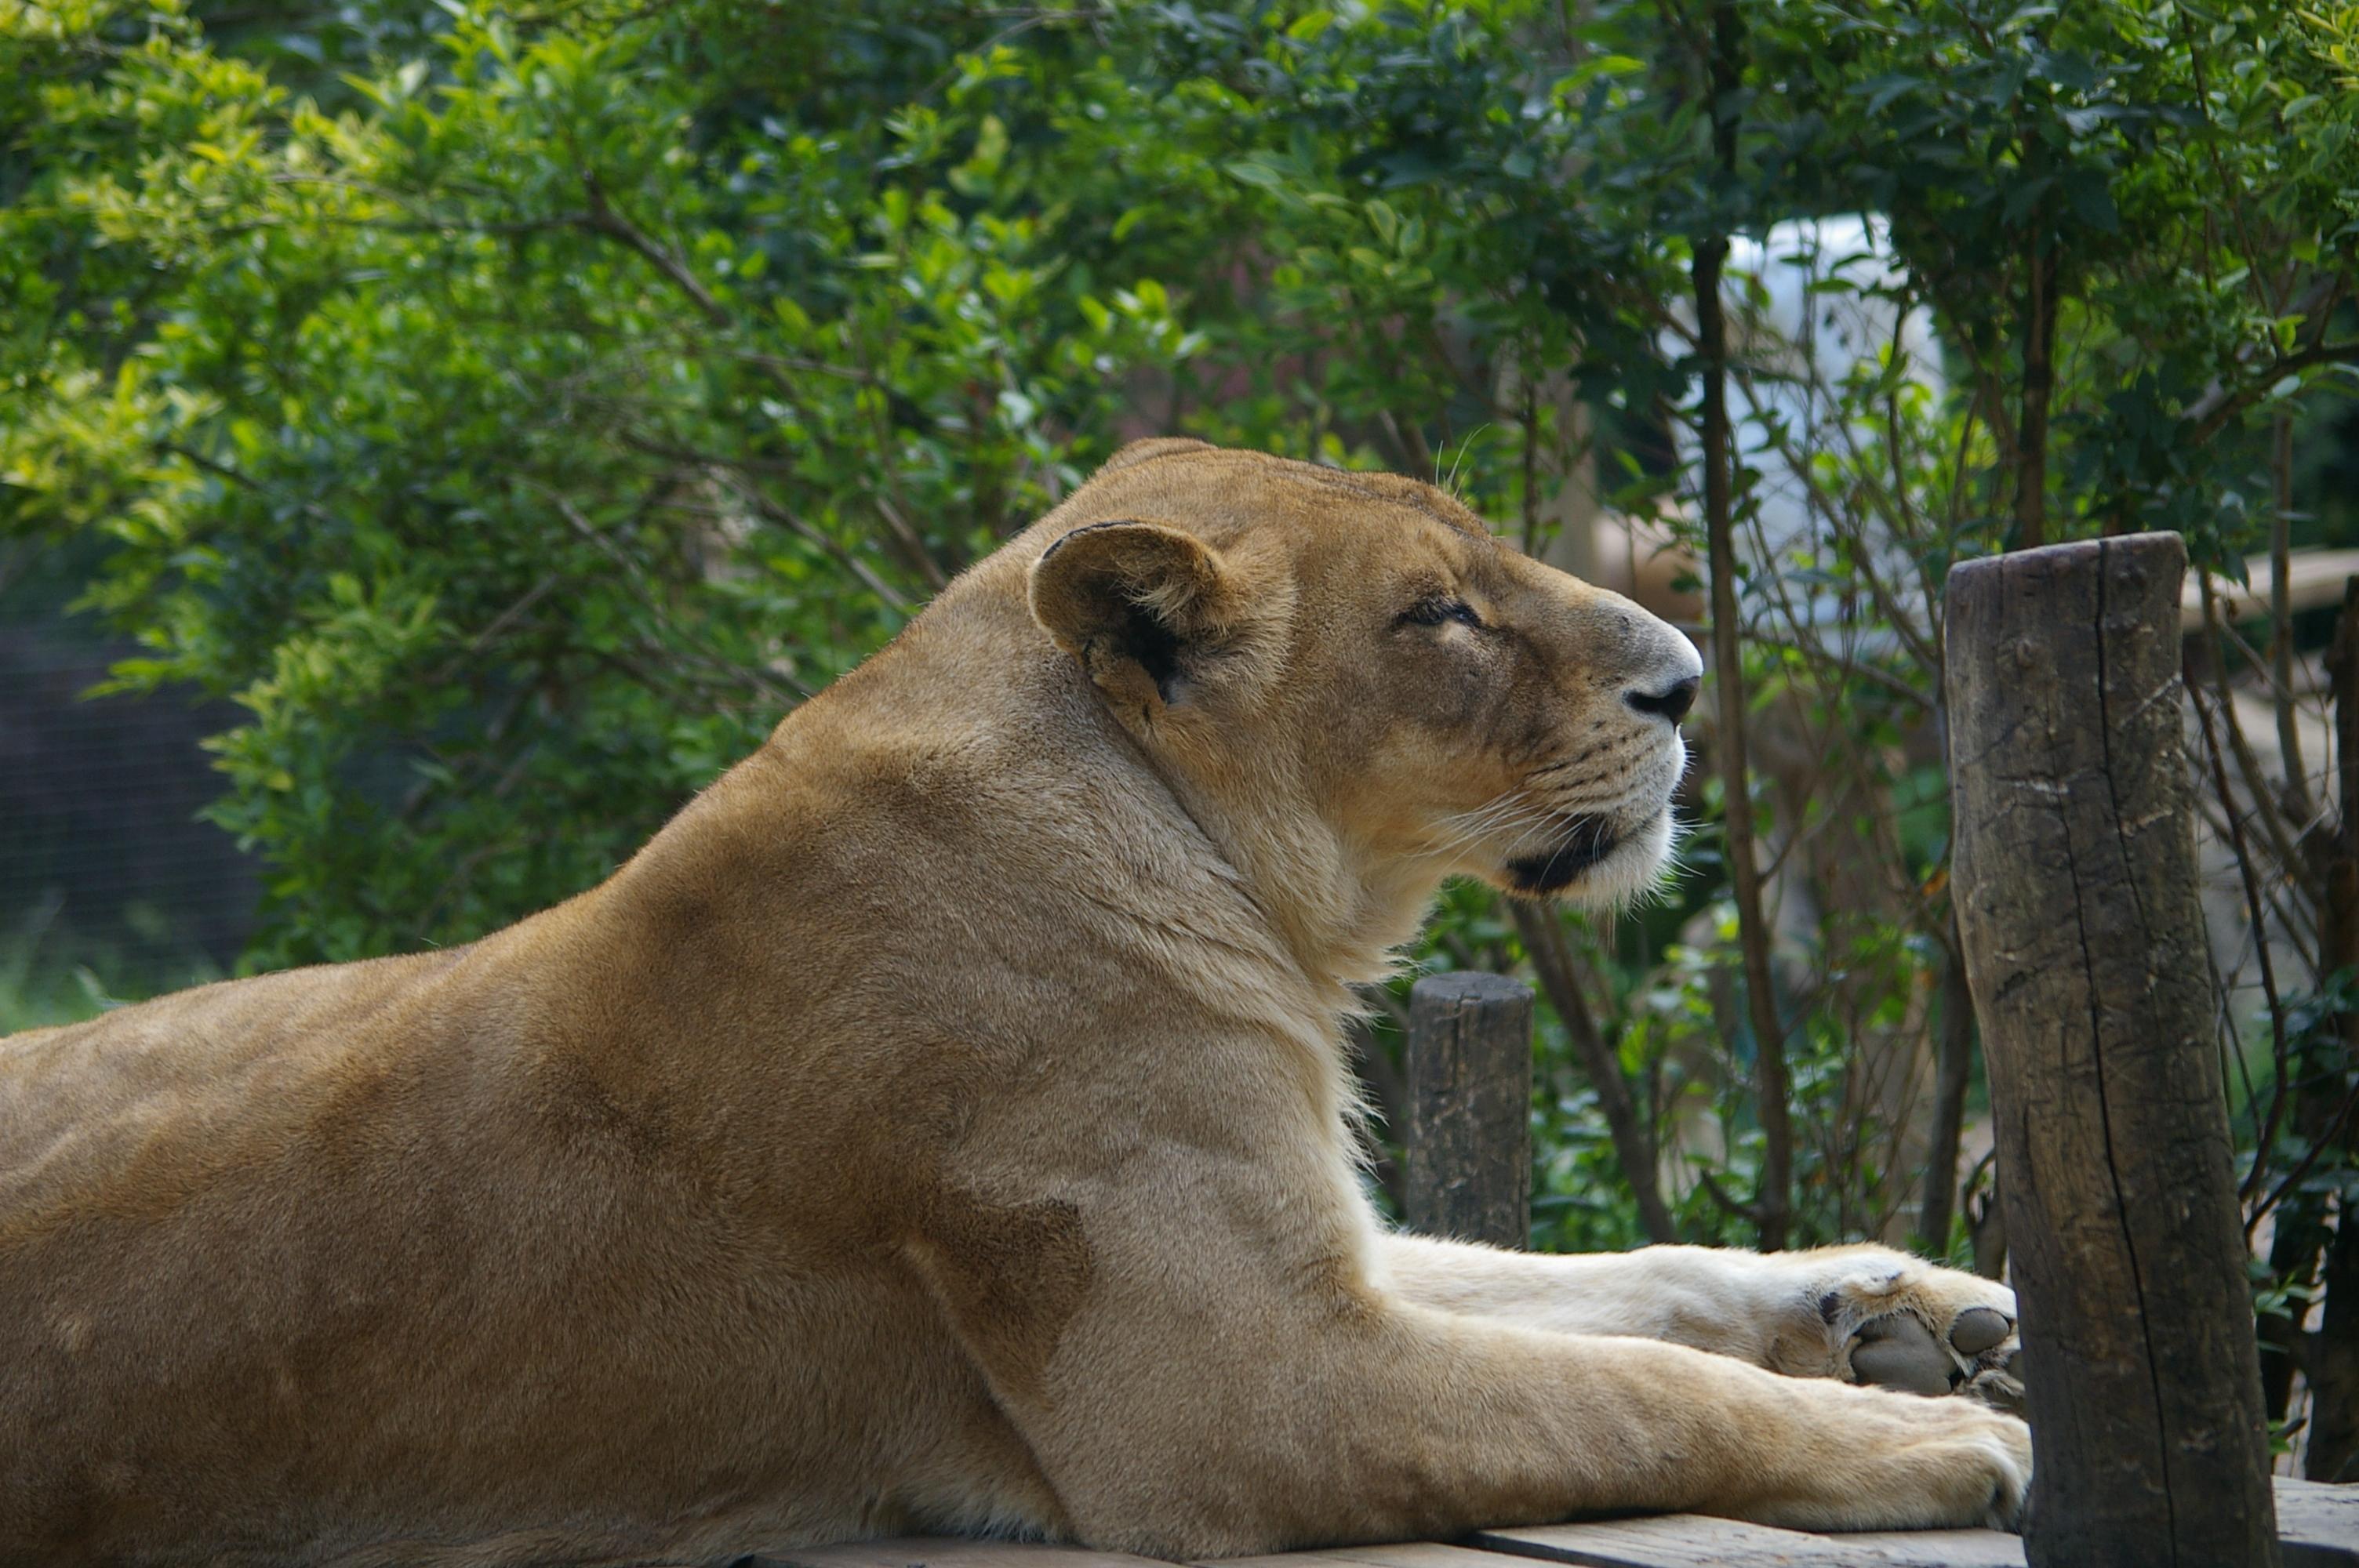 Lioness, Animal, Big, Carnivore, Cat, HQ Photo